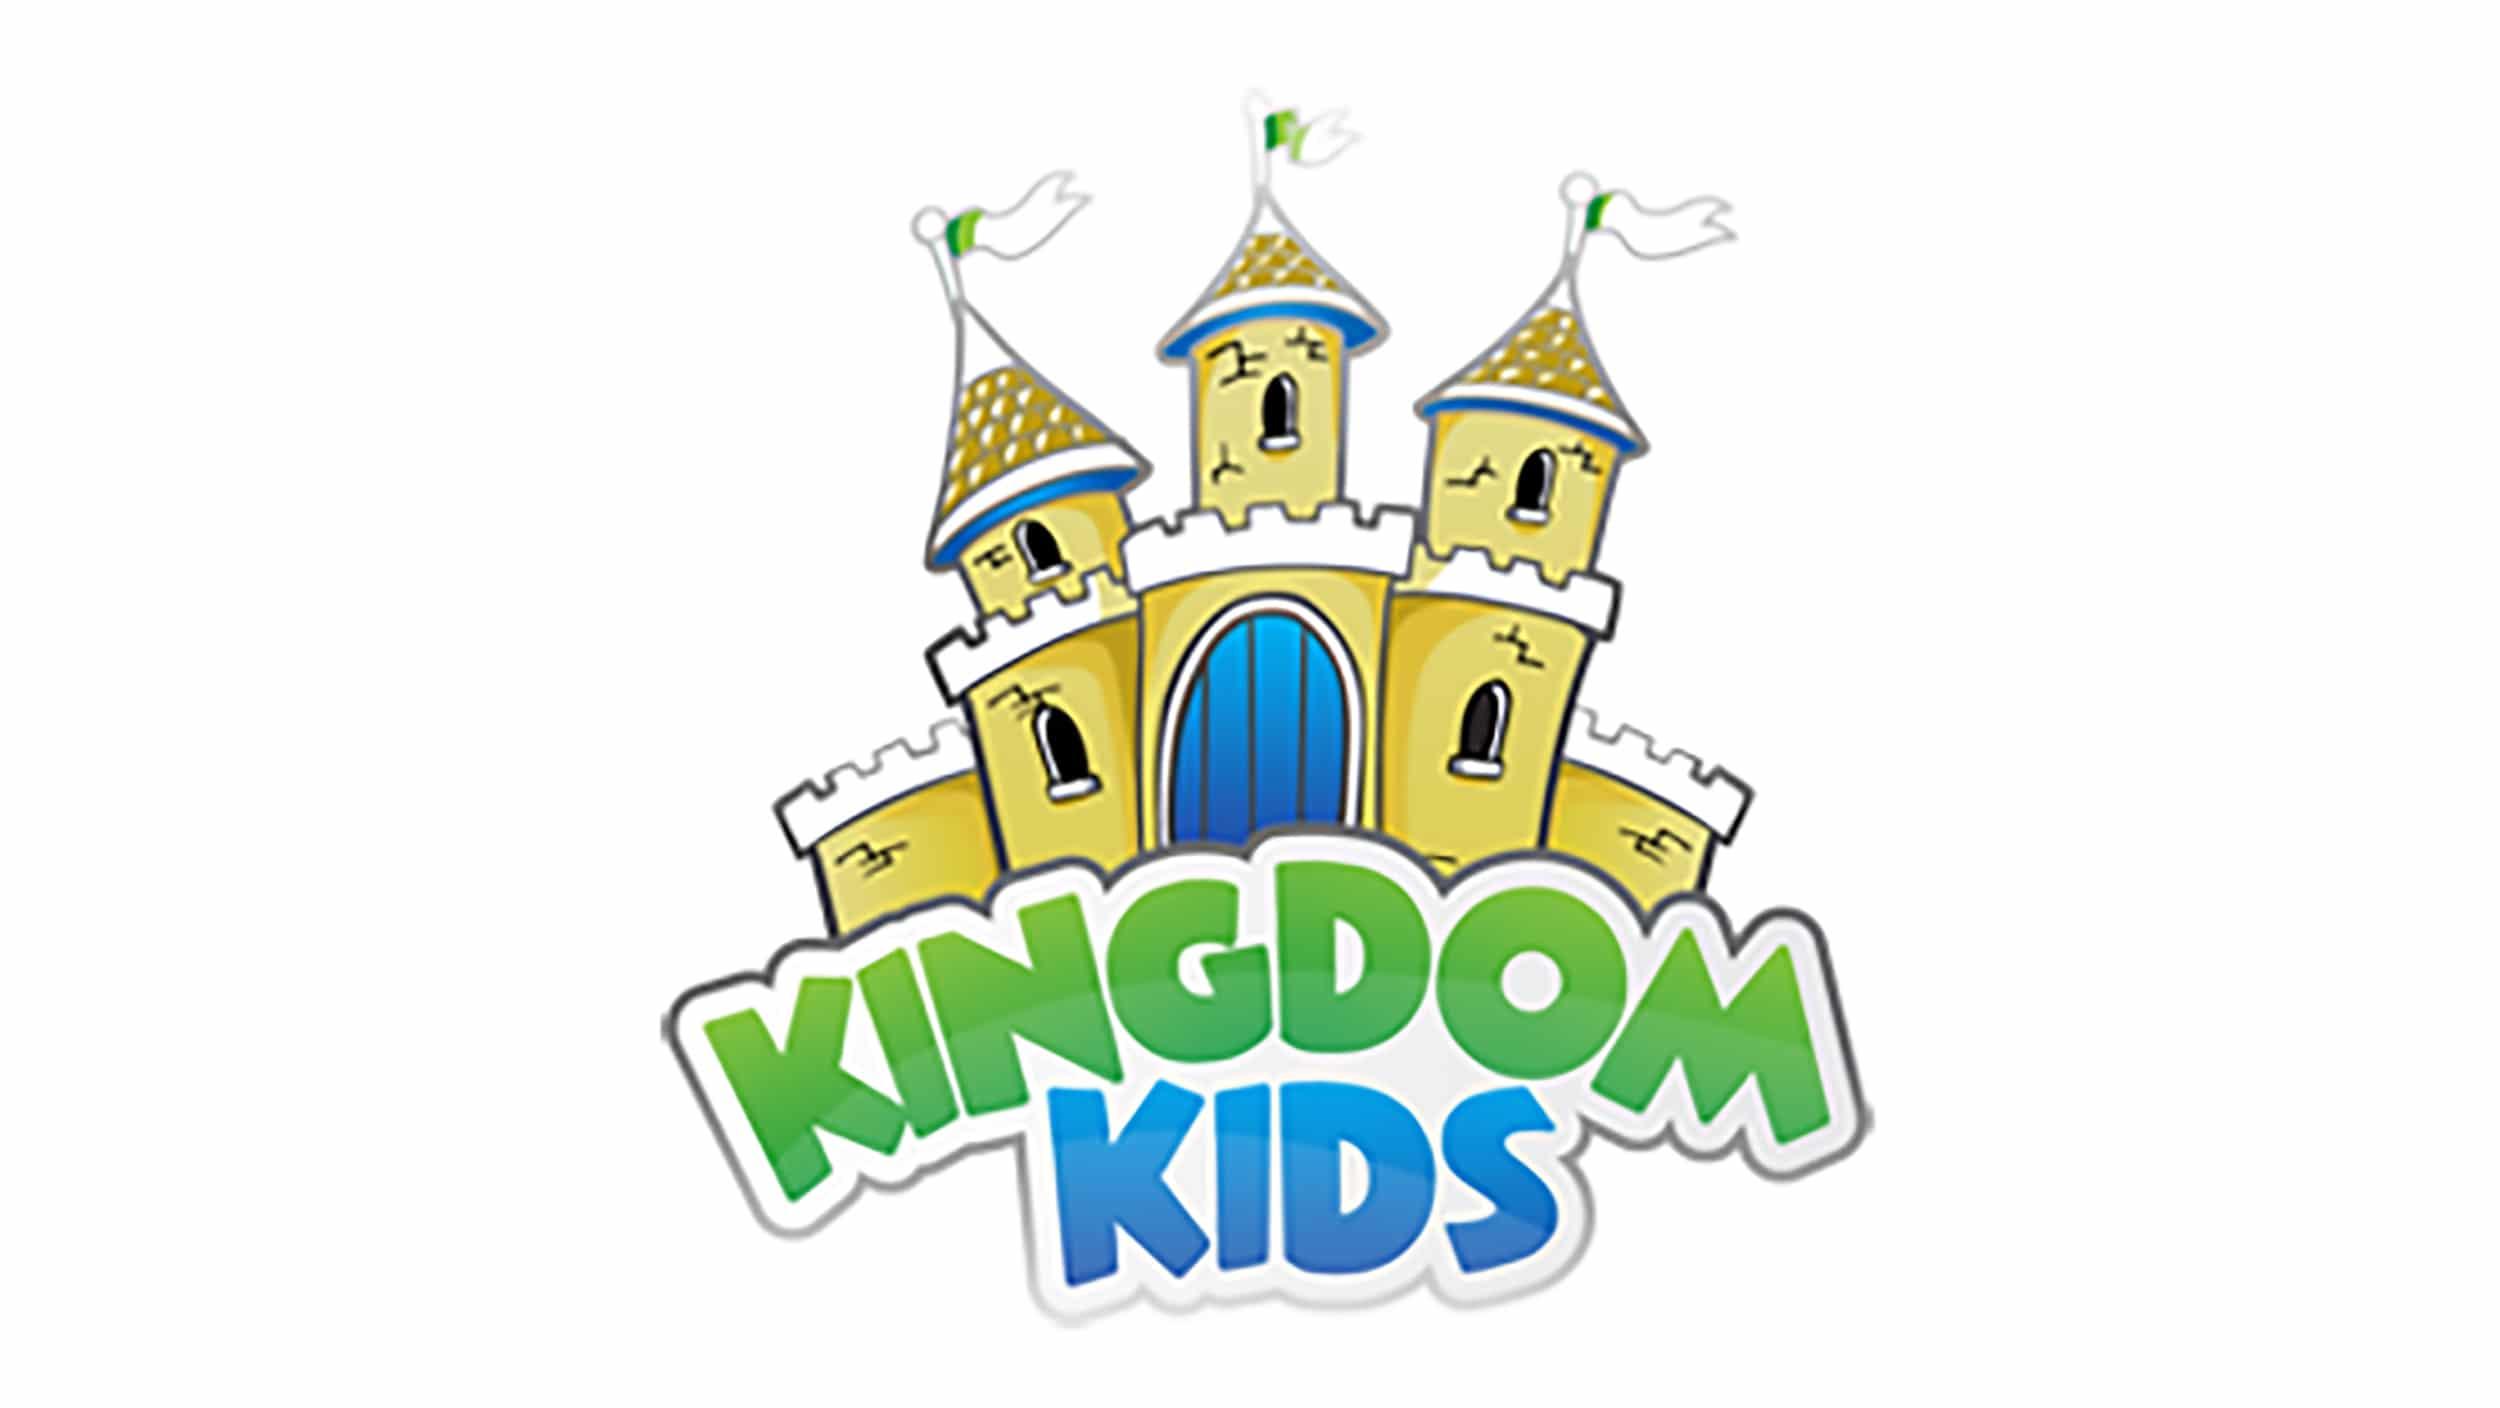 Childrens Church Kingdom Kids Logo Final